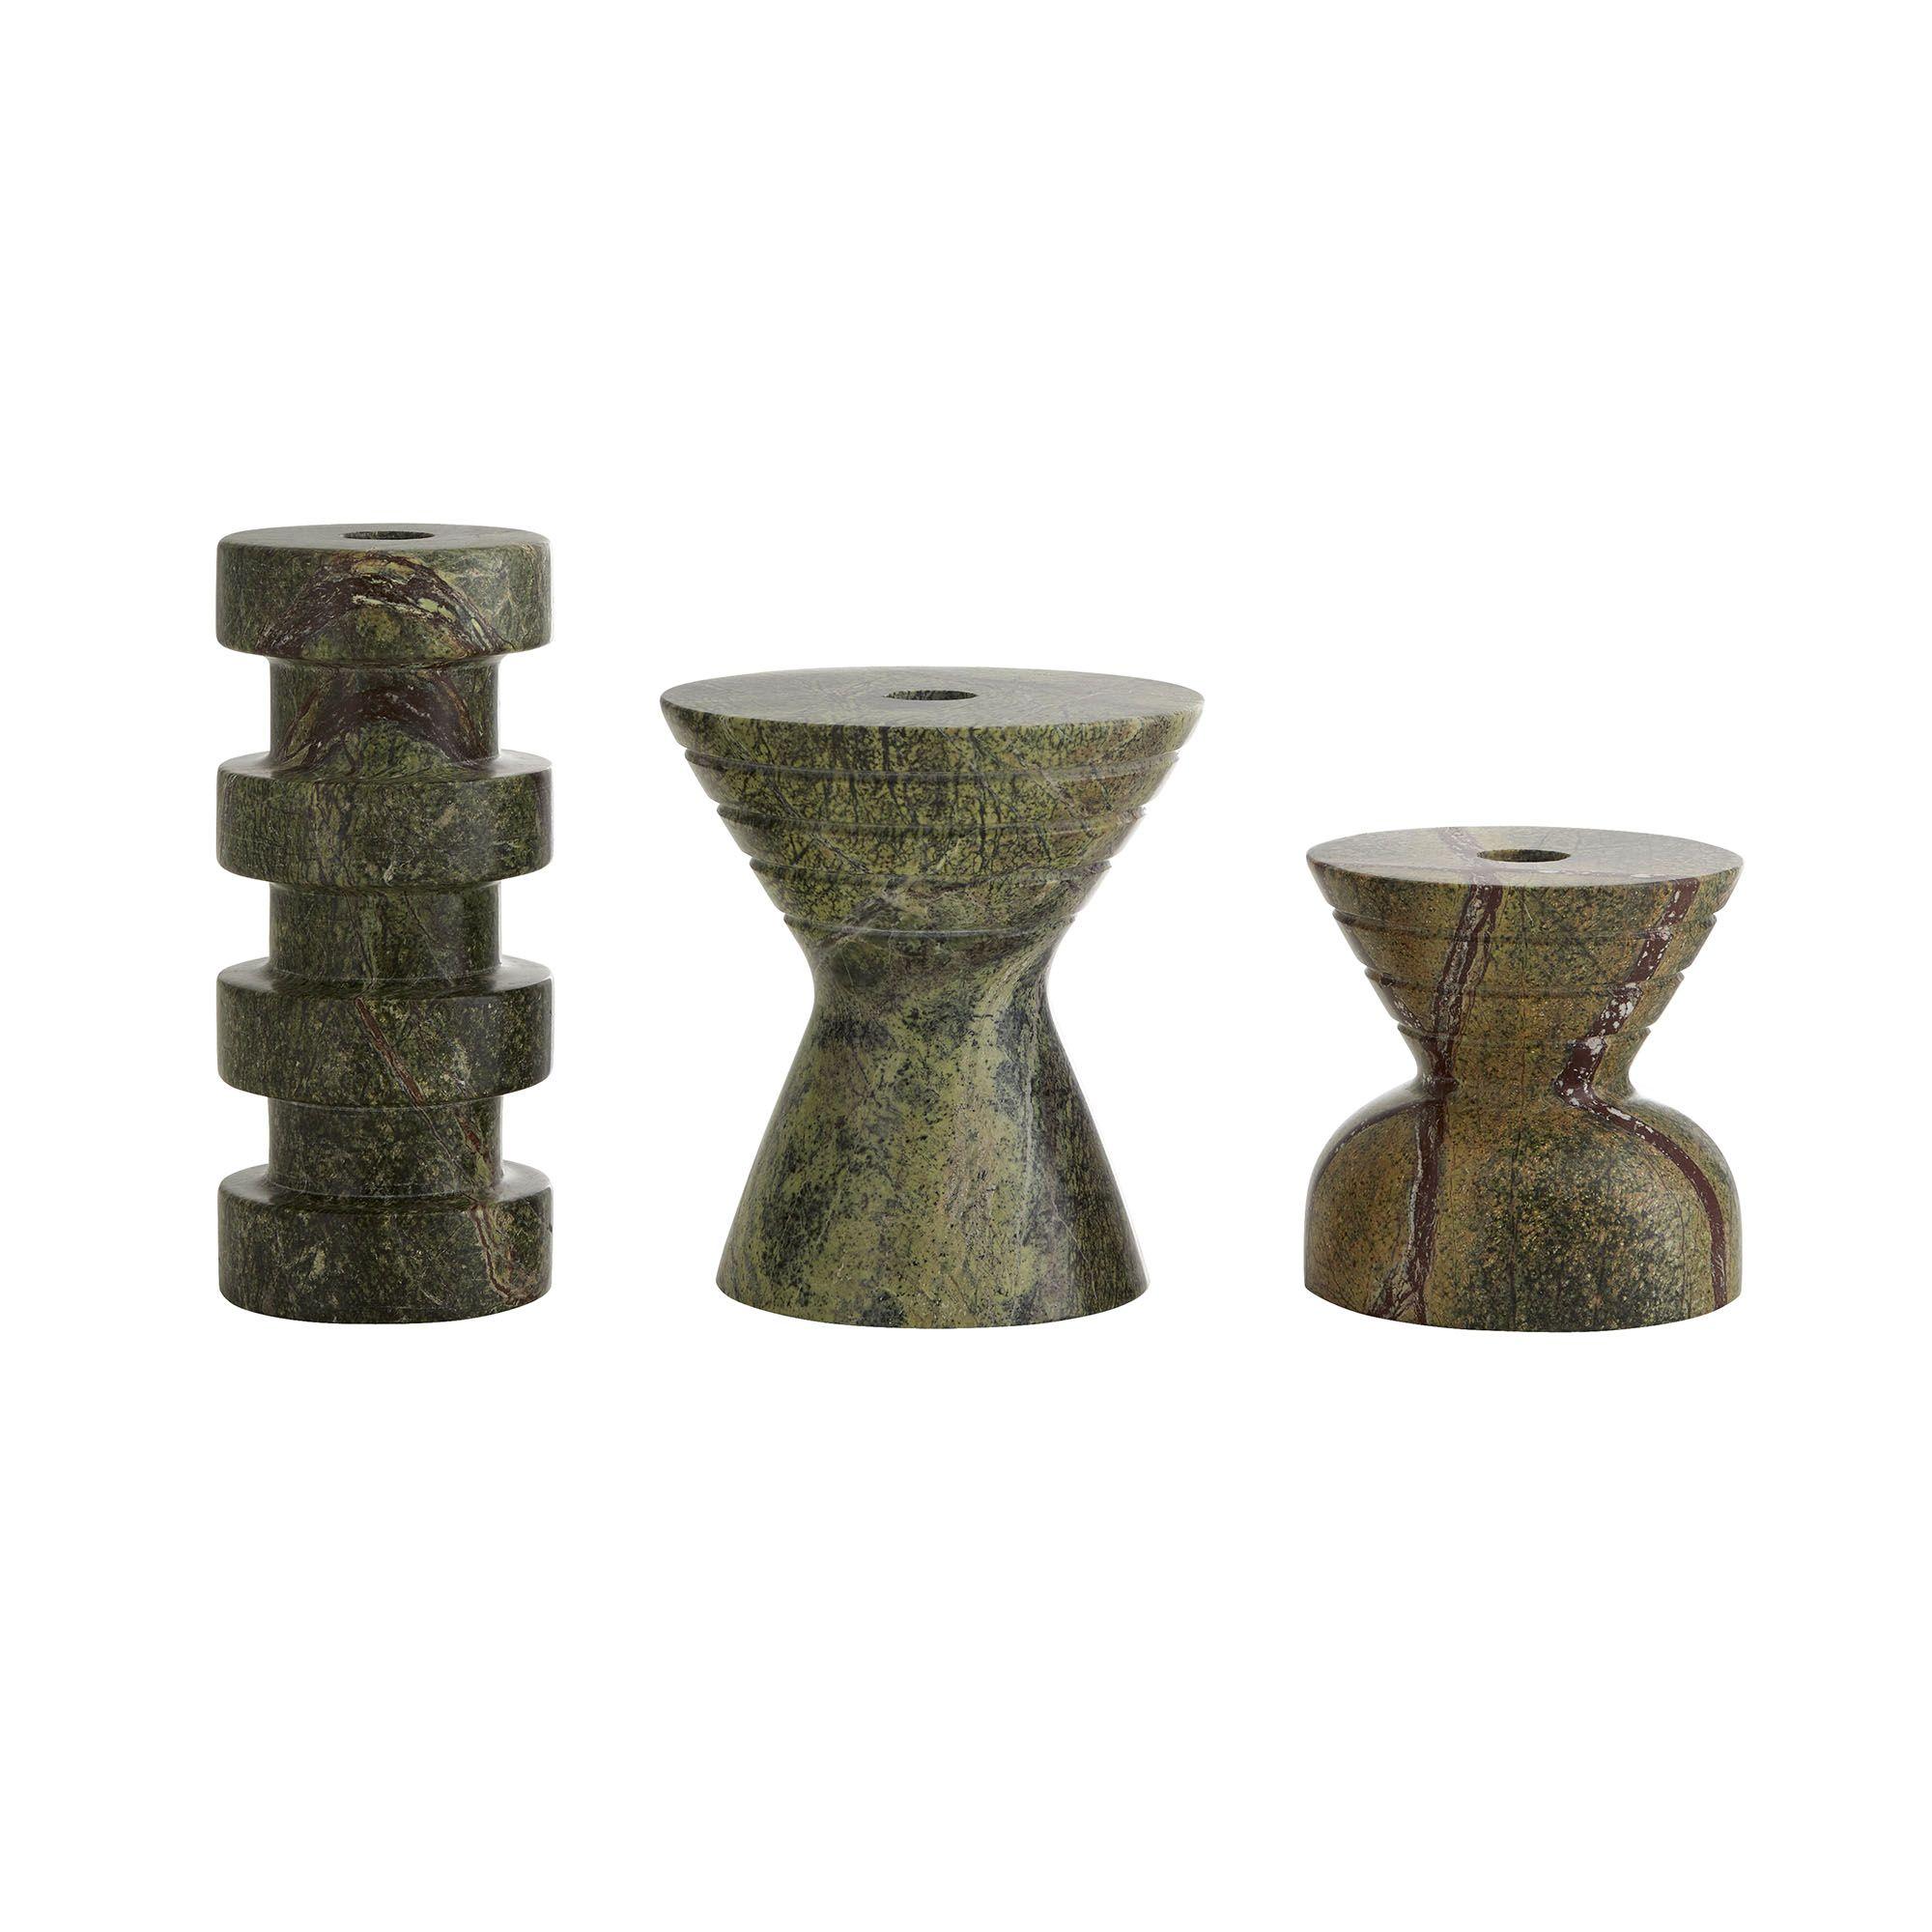 Lopez Candleholders, Set of 3